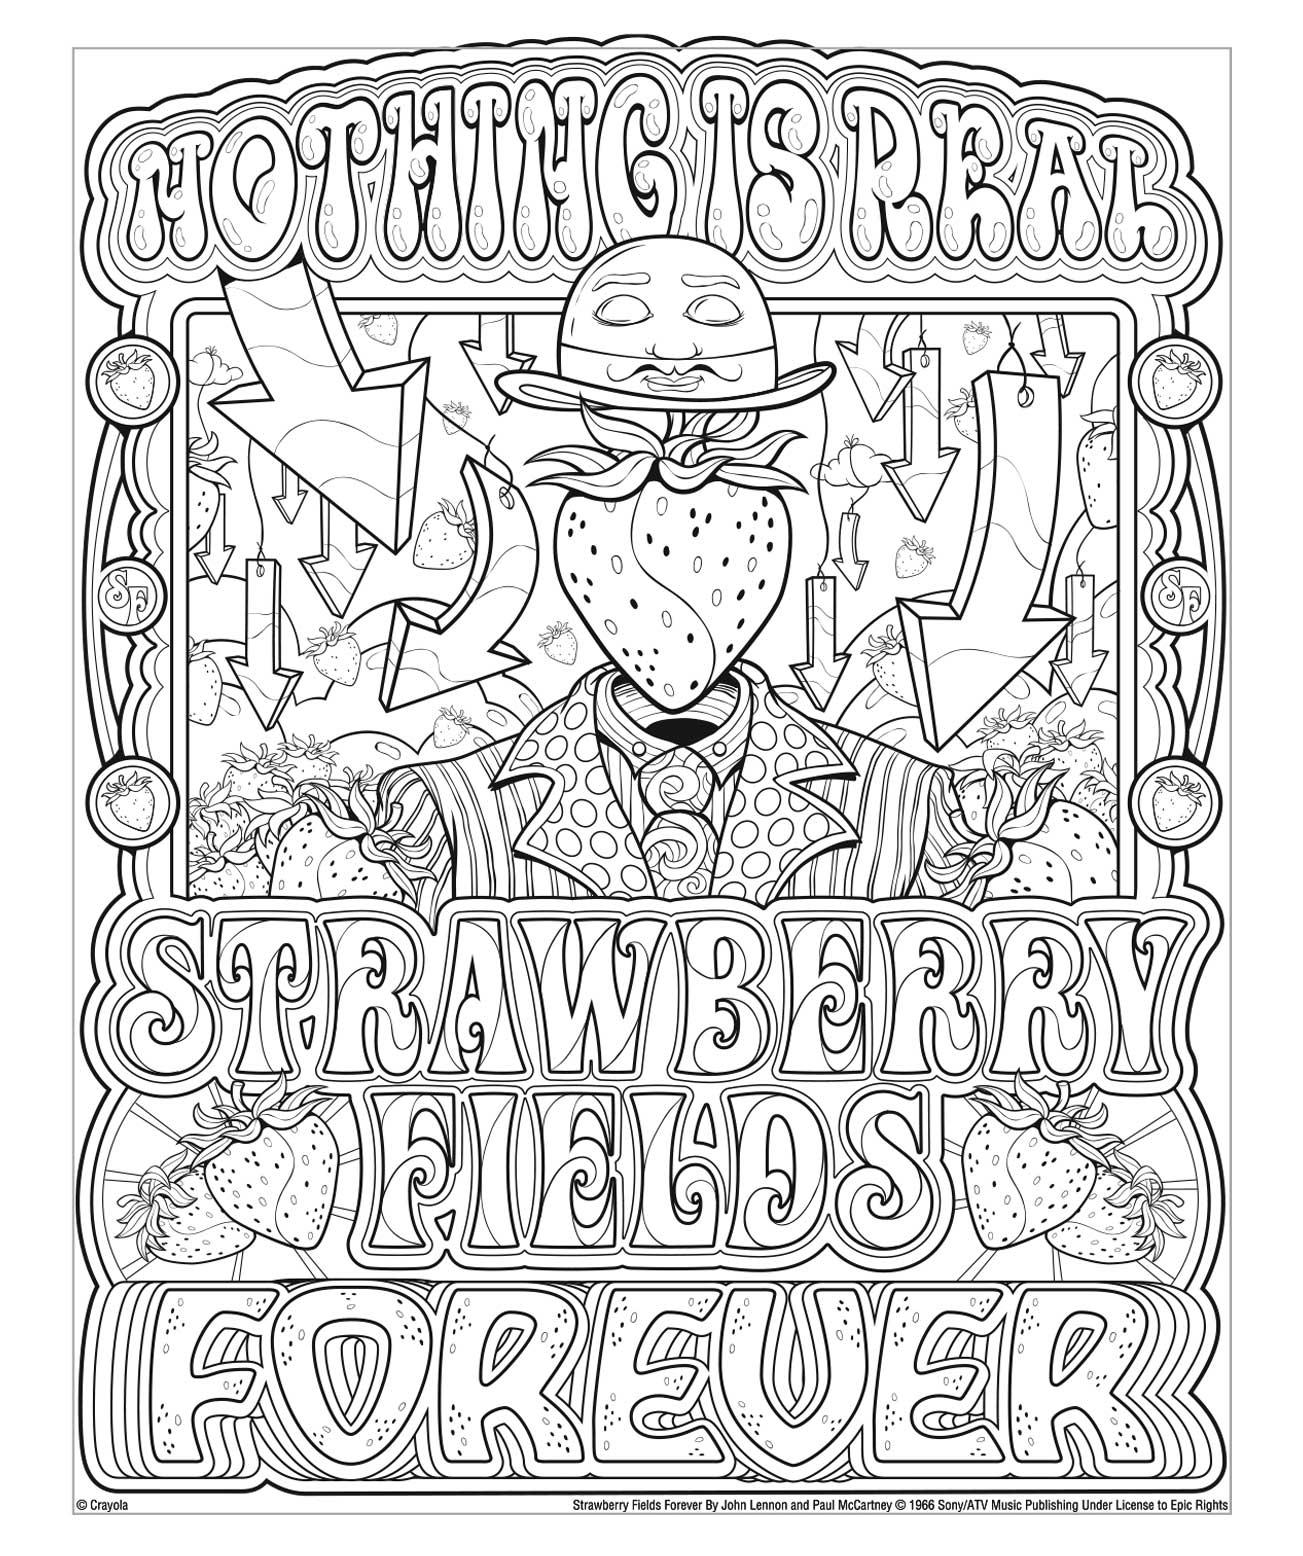 Lennon And McCartney Strawberry Fields Crayola.com